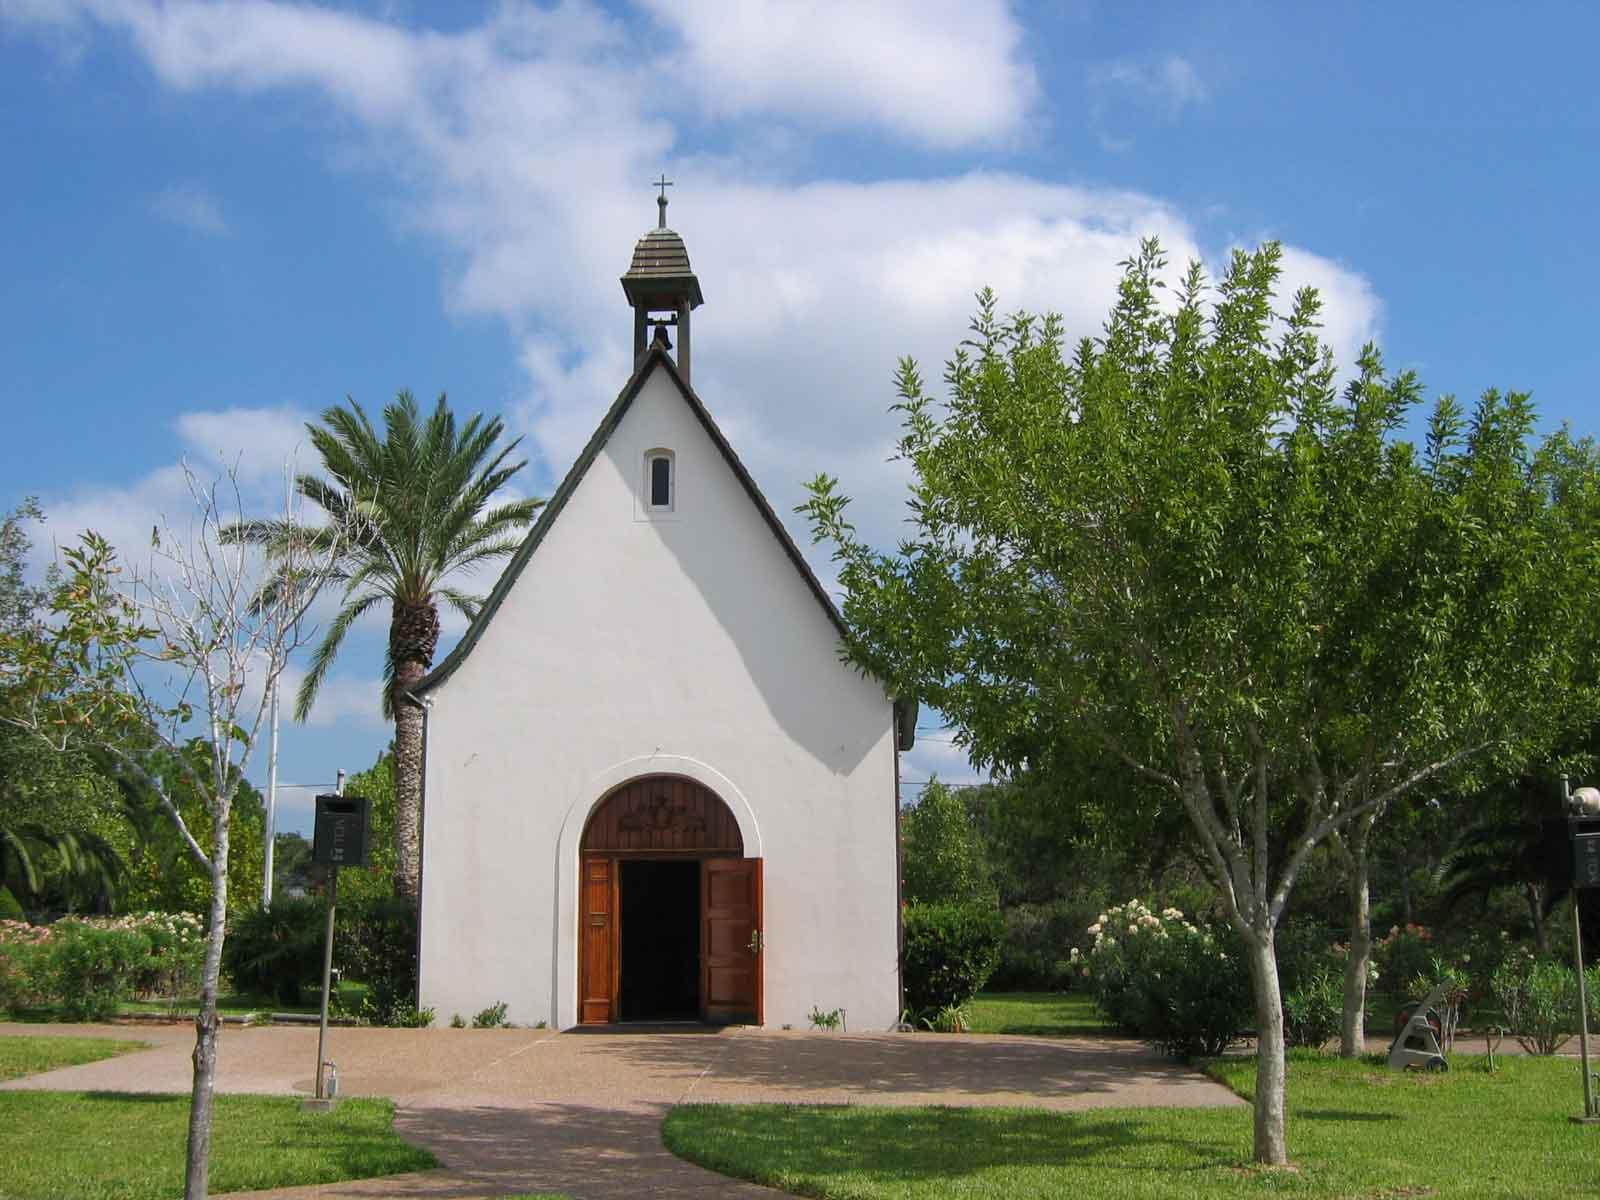 The Shrine at Lamar Schoenstatt Lamar TX USA 1600x1200